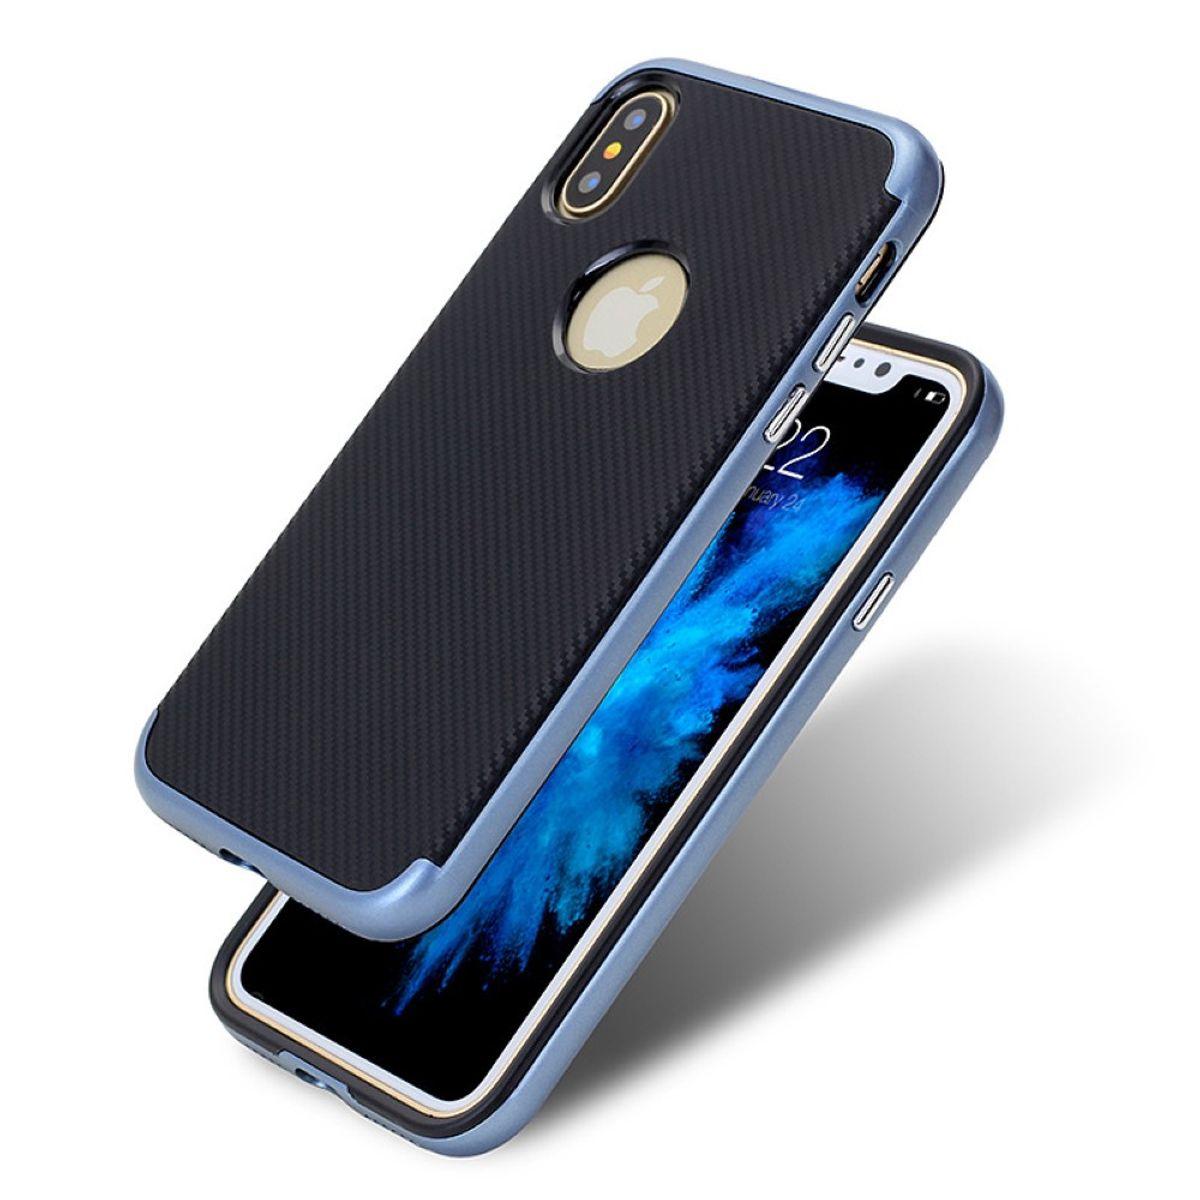 Hybrid Silikon Handy Hülle für Apple iPhone XS Case Cover Tasche Blau